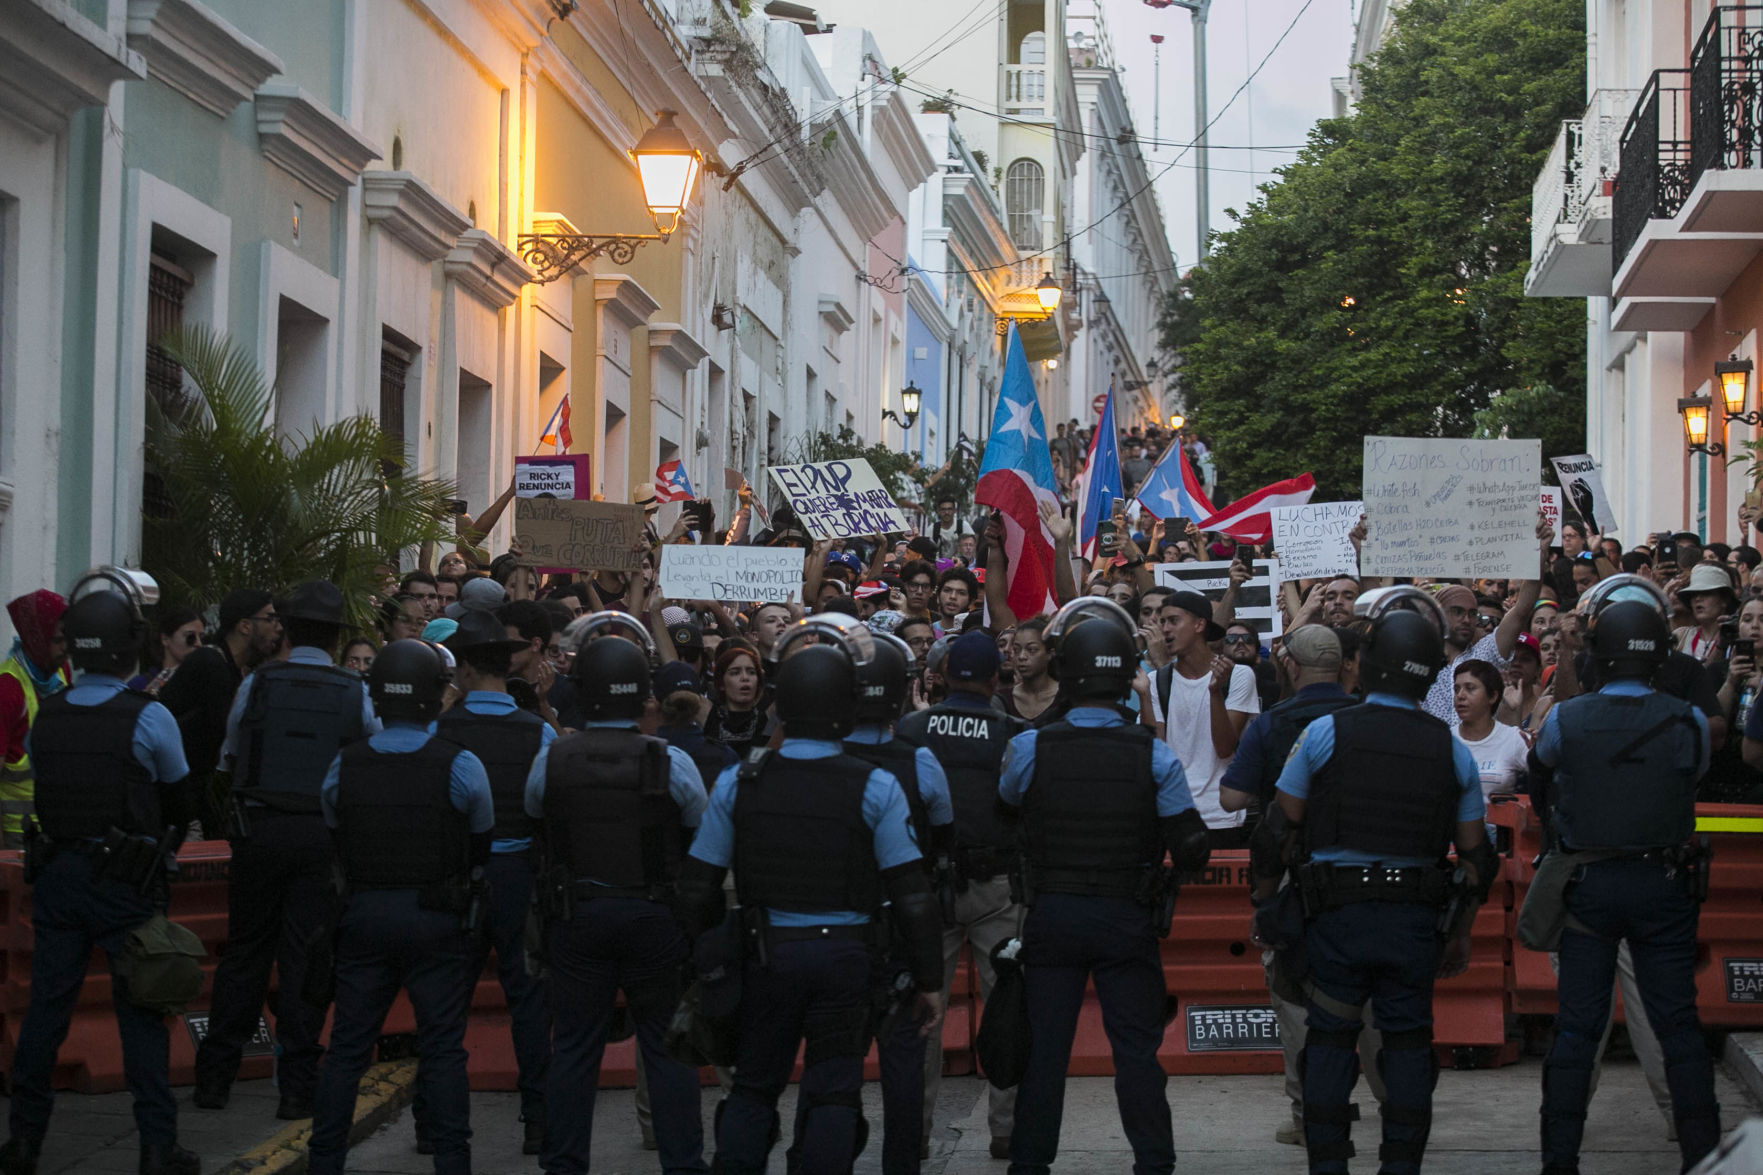 Escaleras ofrece detalles sobre manifestación en Viejo San Juan